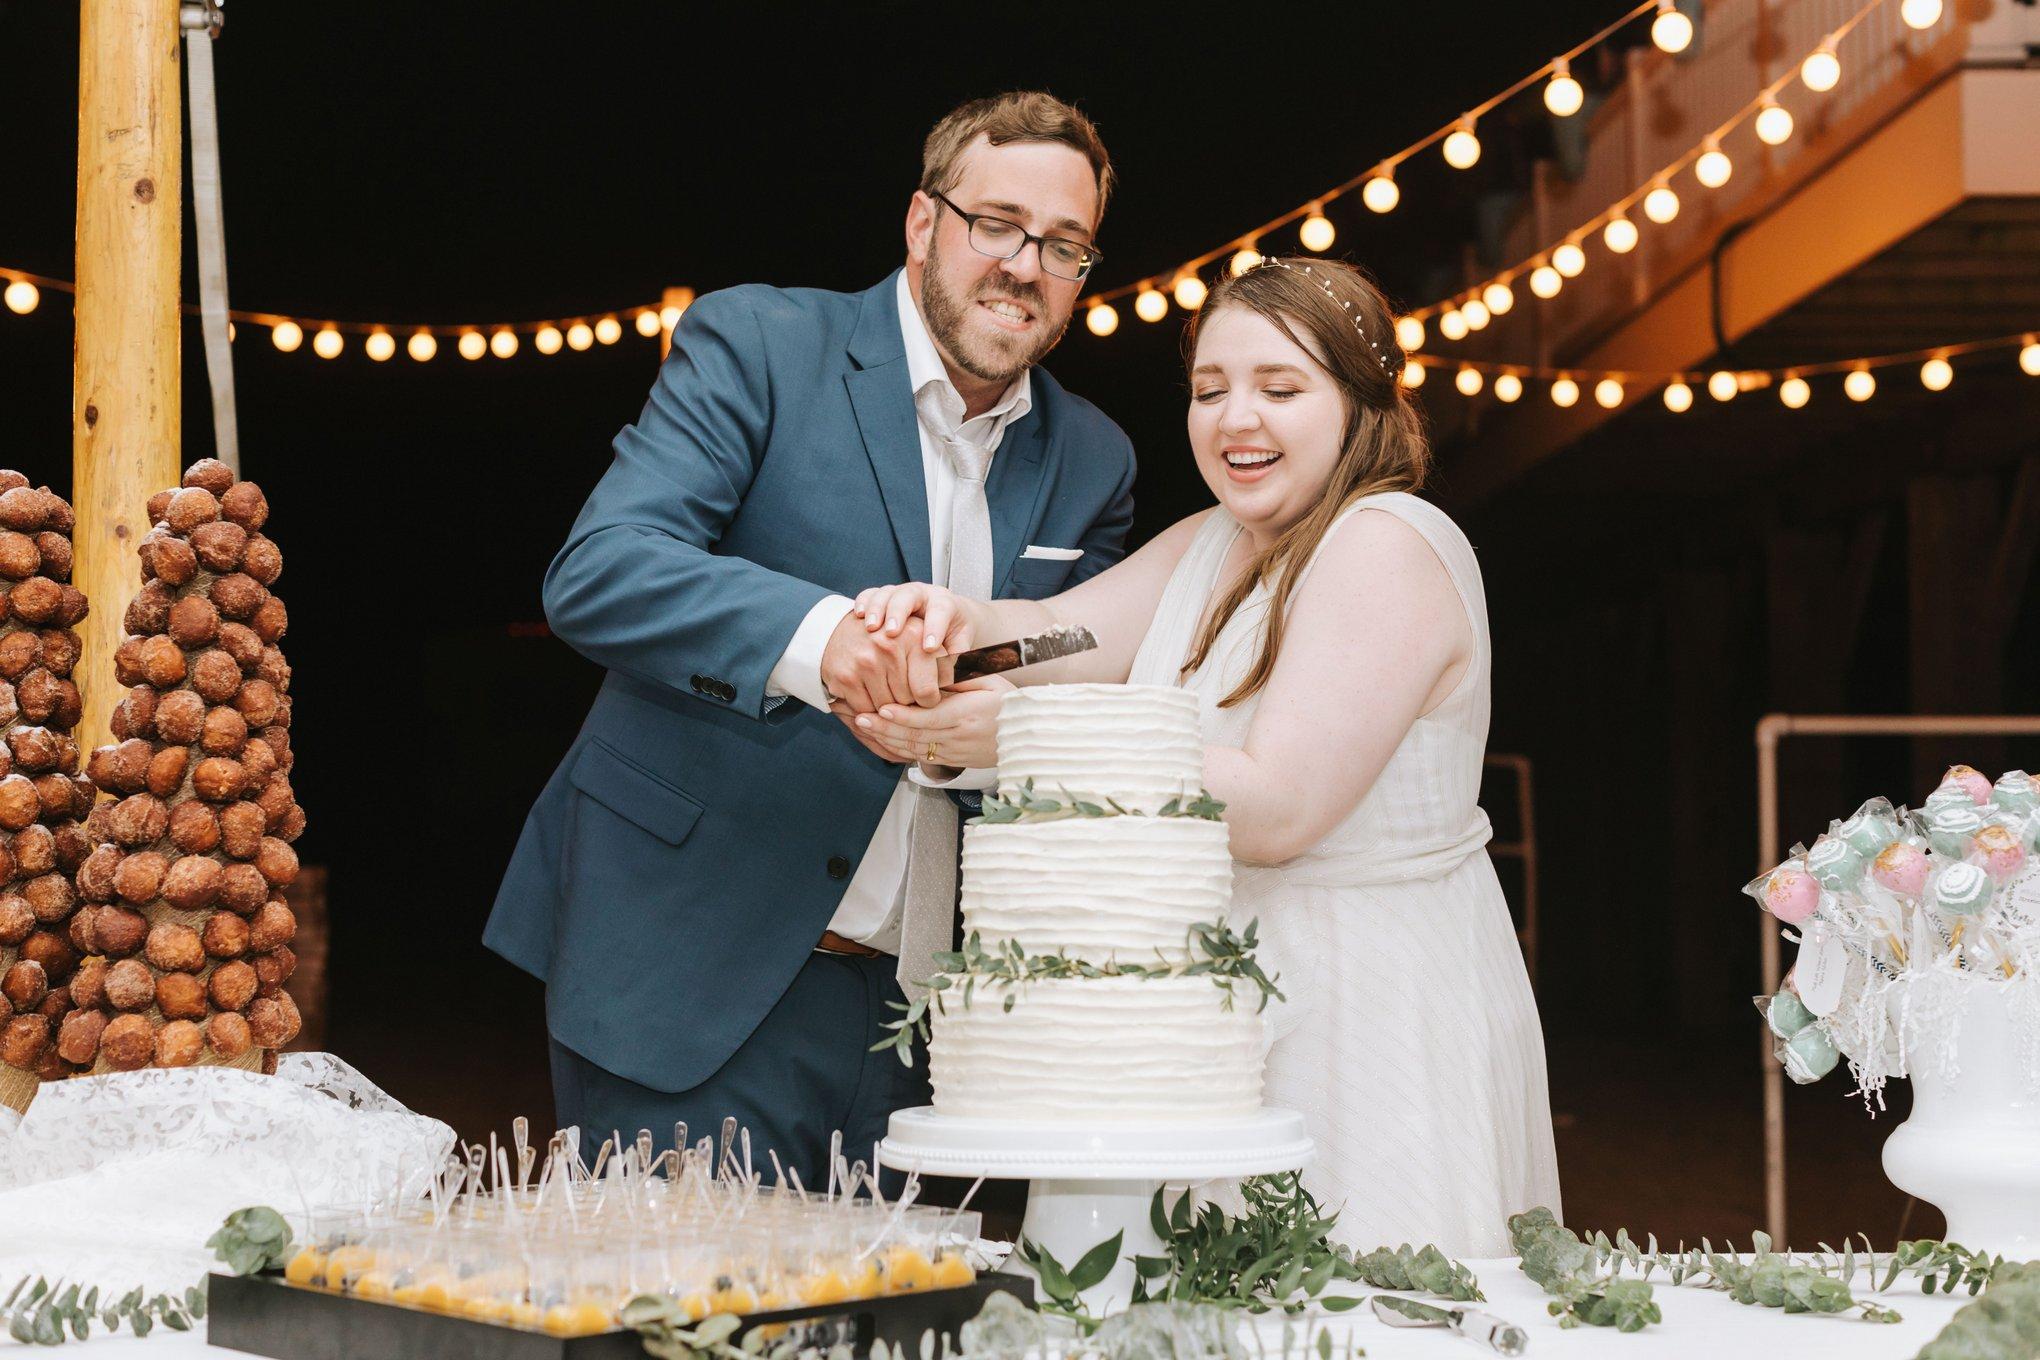 Newport-Wedding-Backyard-Photographer-43.jpg